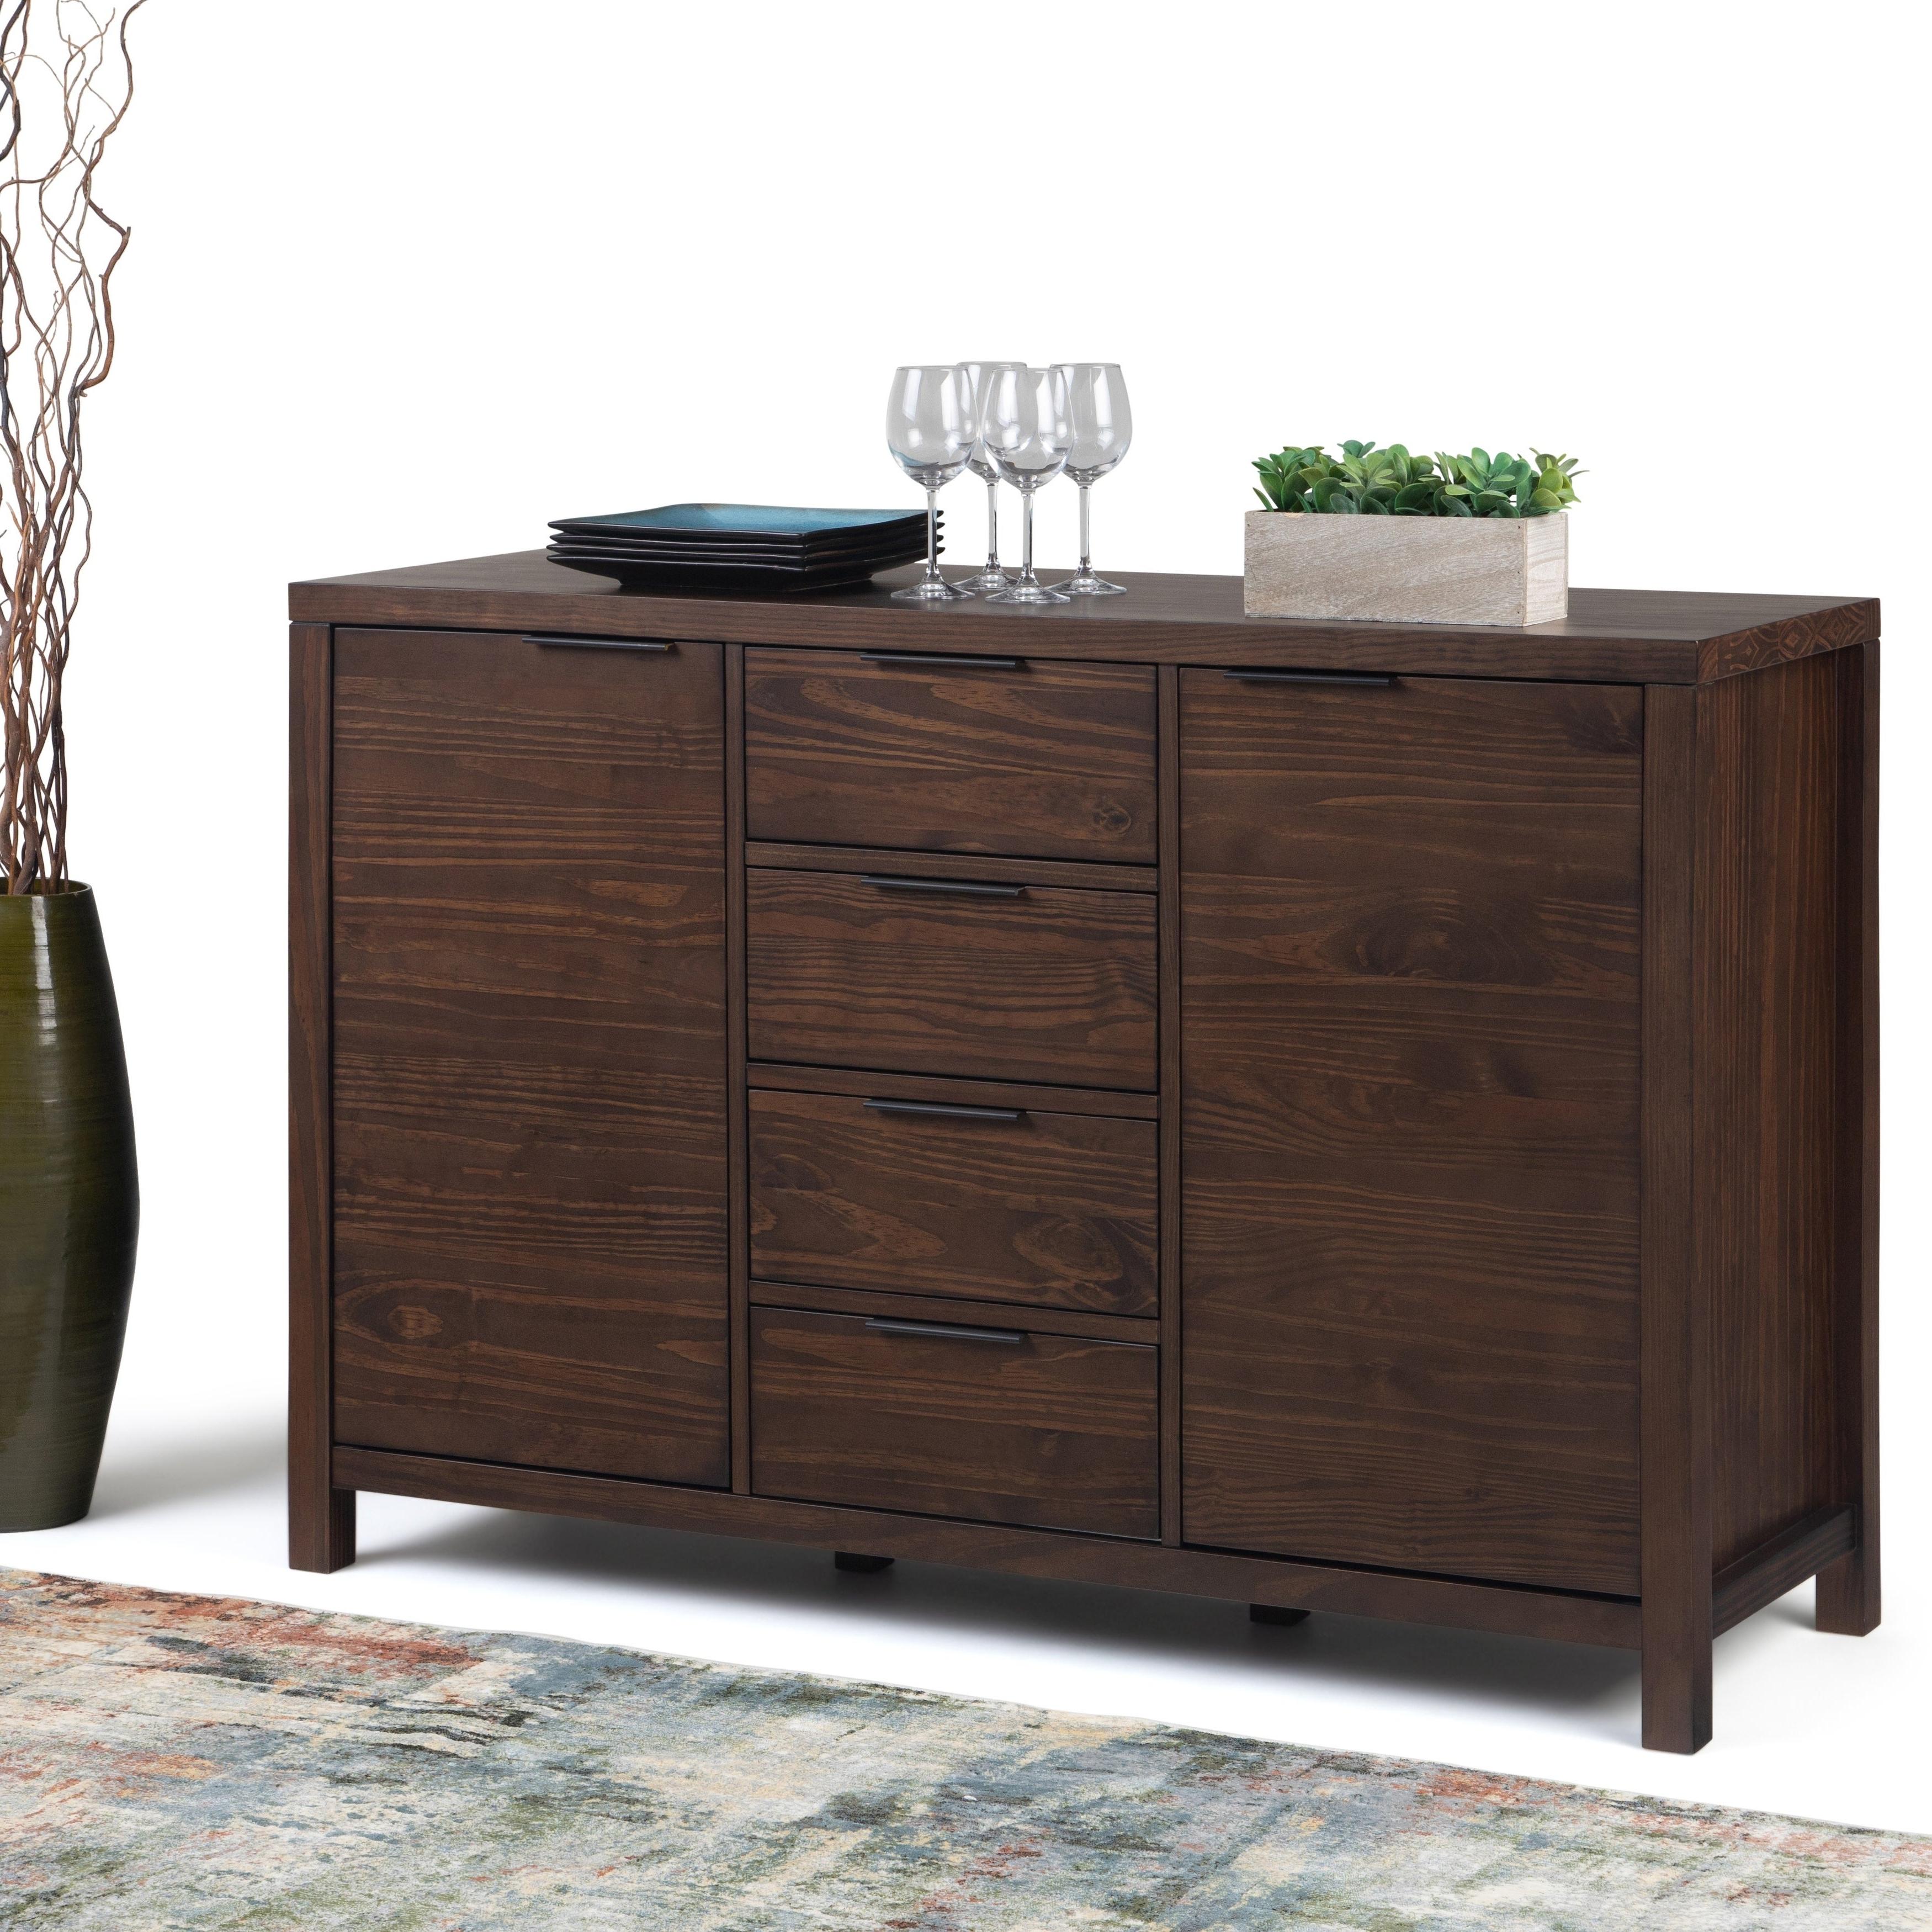 Wyndenhall Fabian Solid Wood 54 Inch Wide Contemporary Modern Sideboard Buffet In Warm Walnut Brown With Strick & Bolton Dallas Walnut Buffets (View 8 of 20)